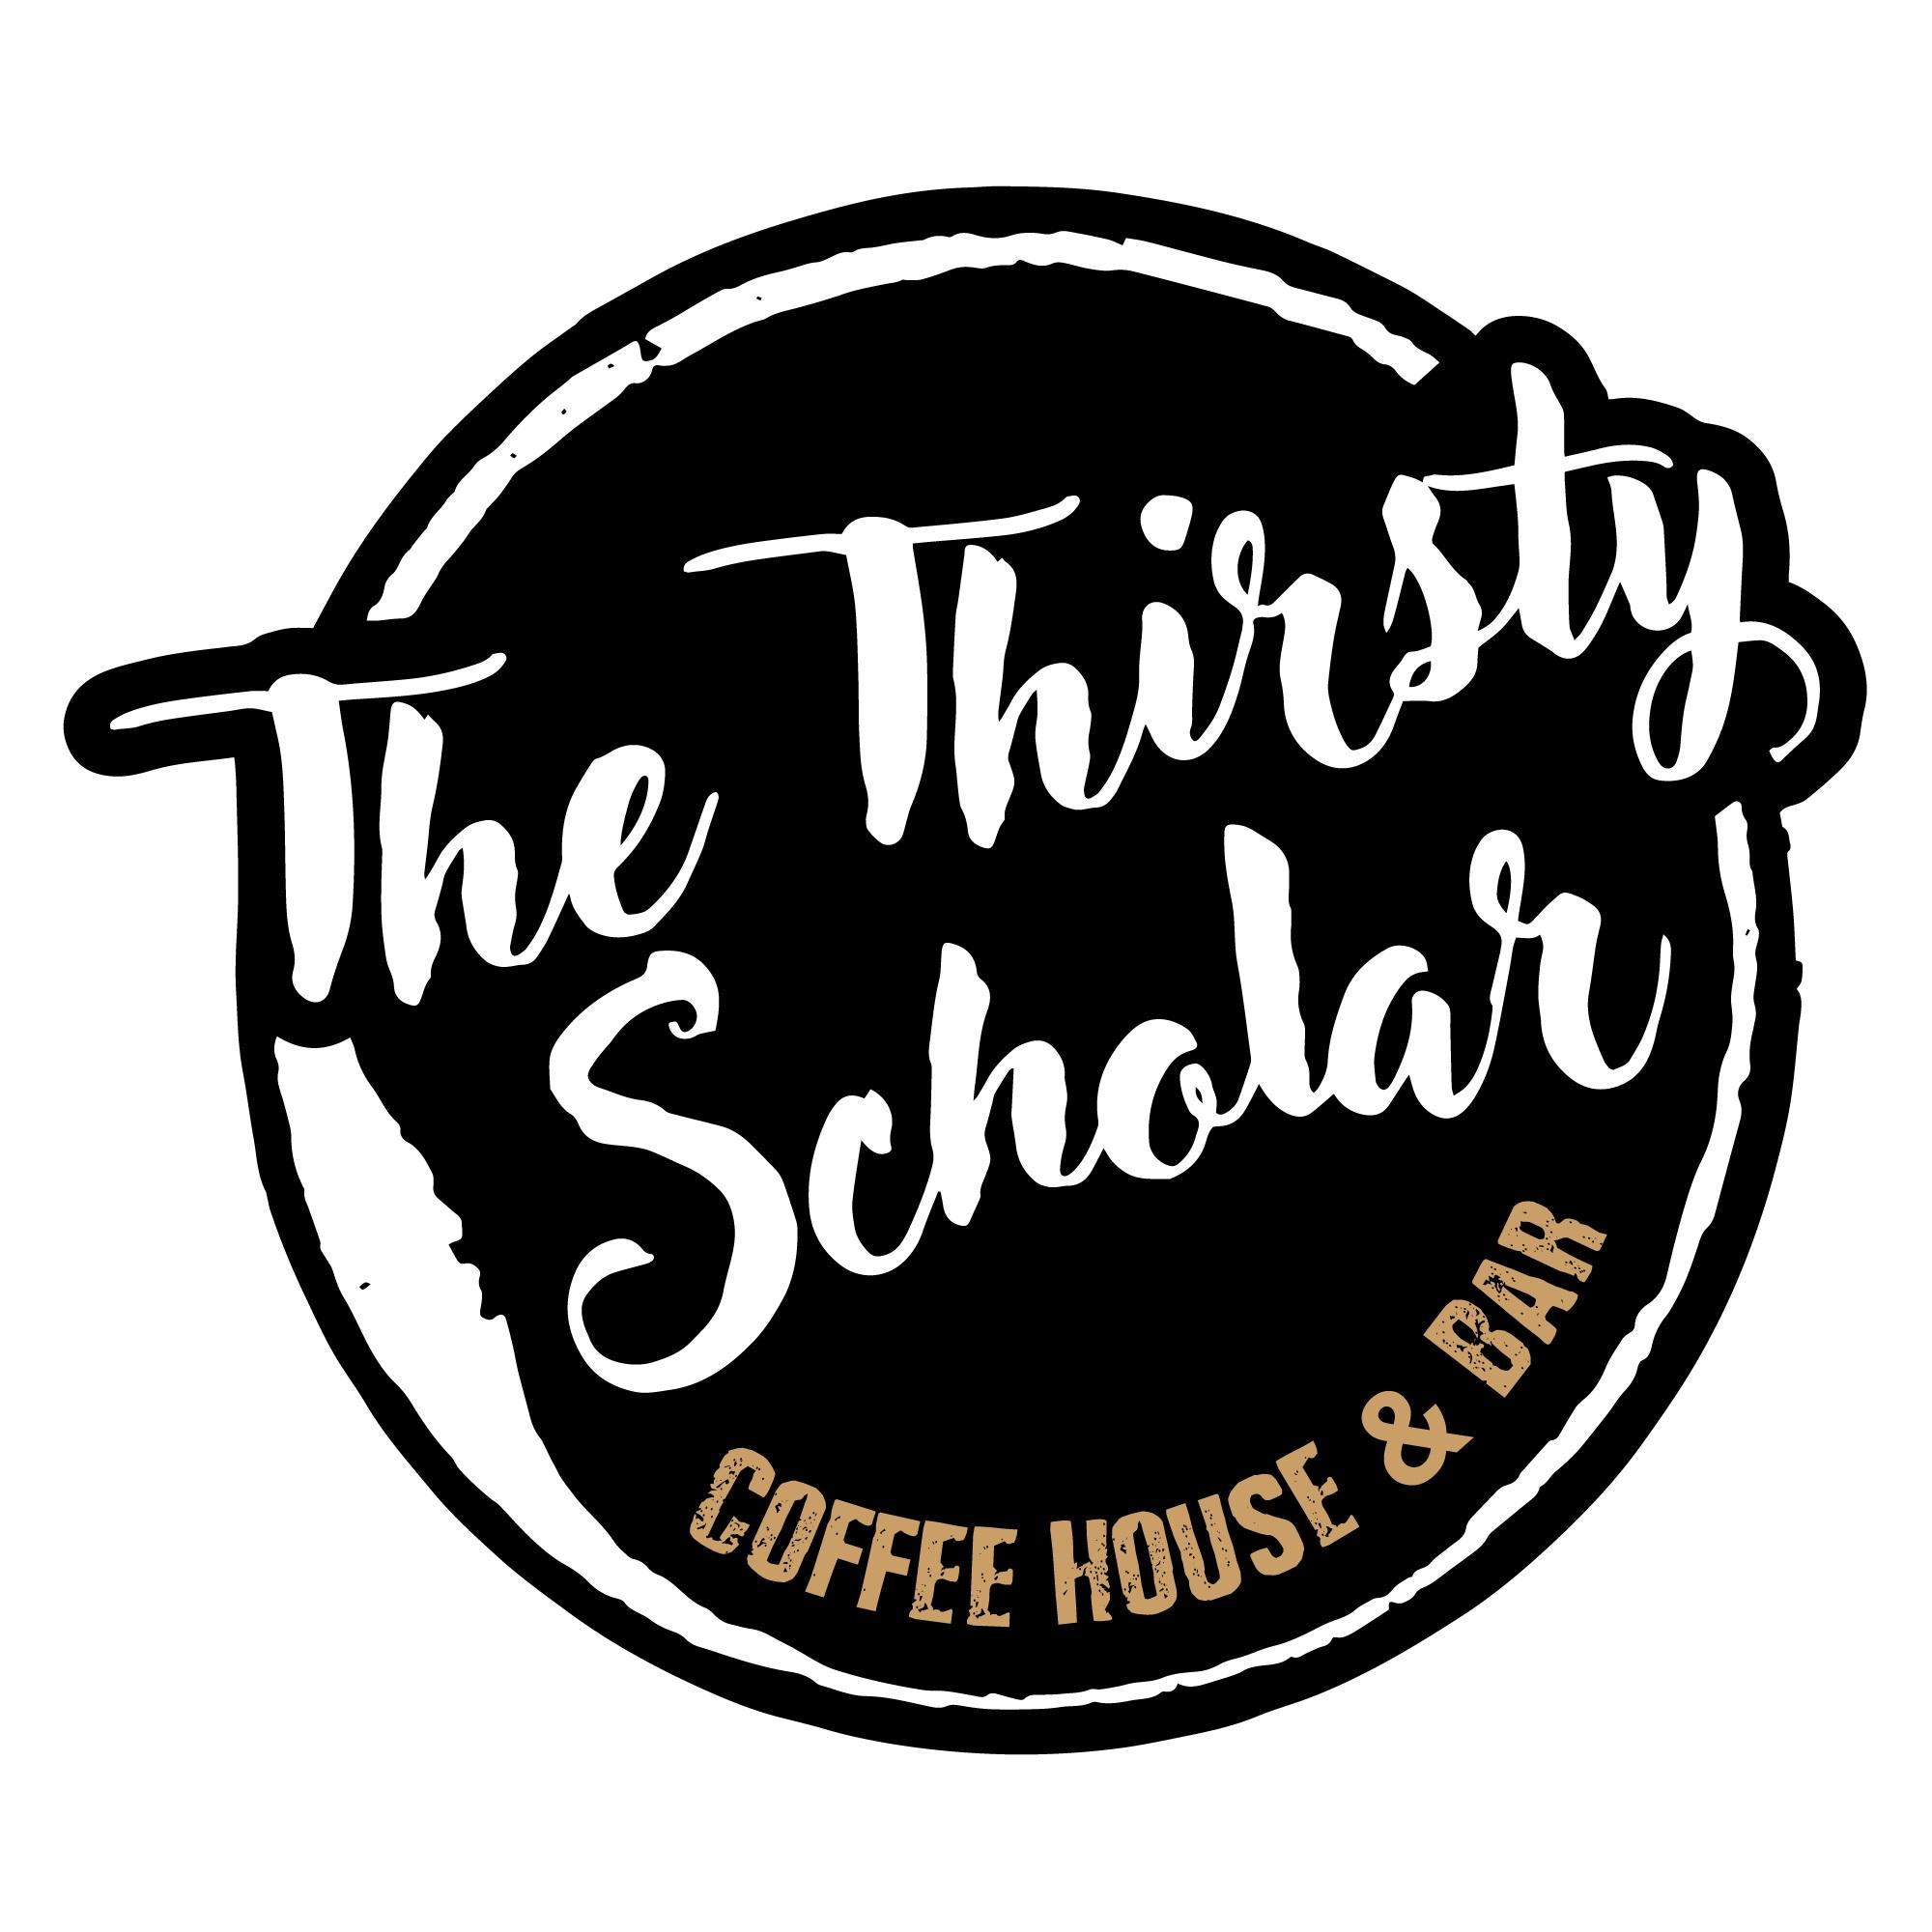 The Thirsty Scholar